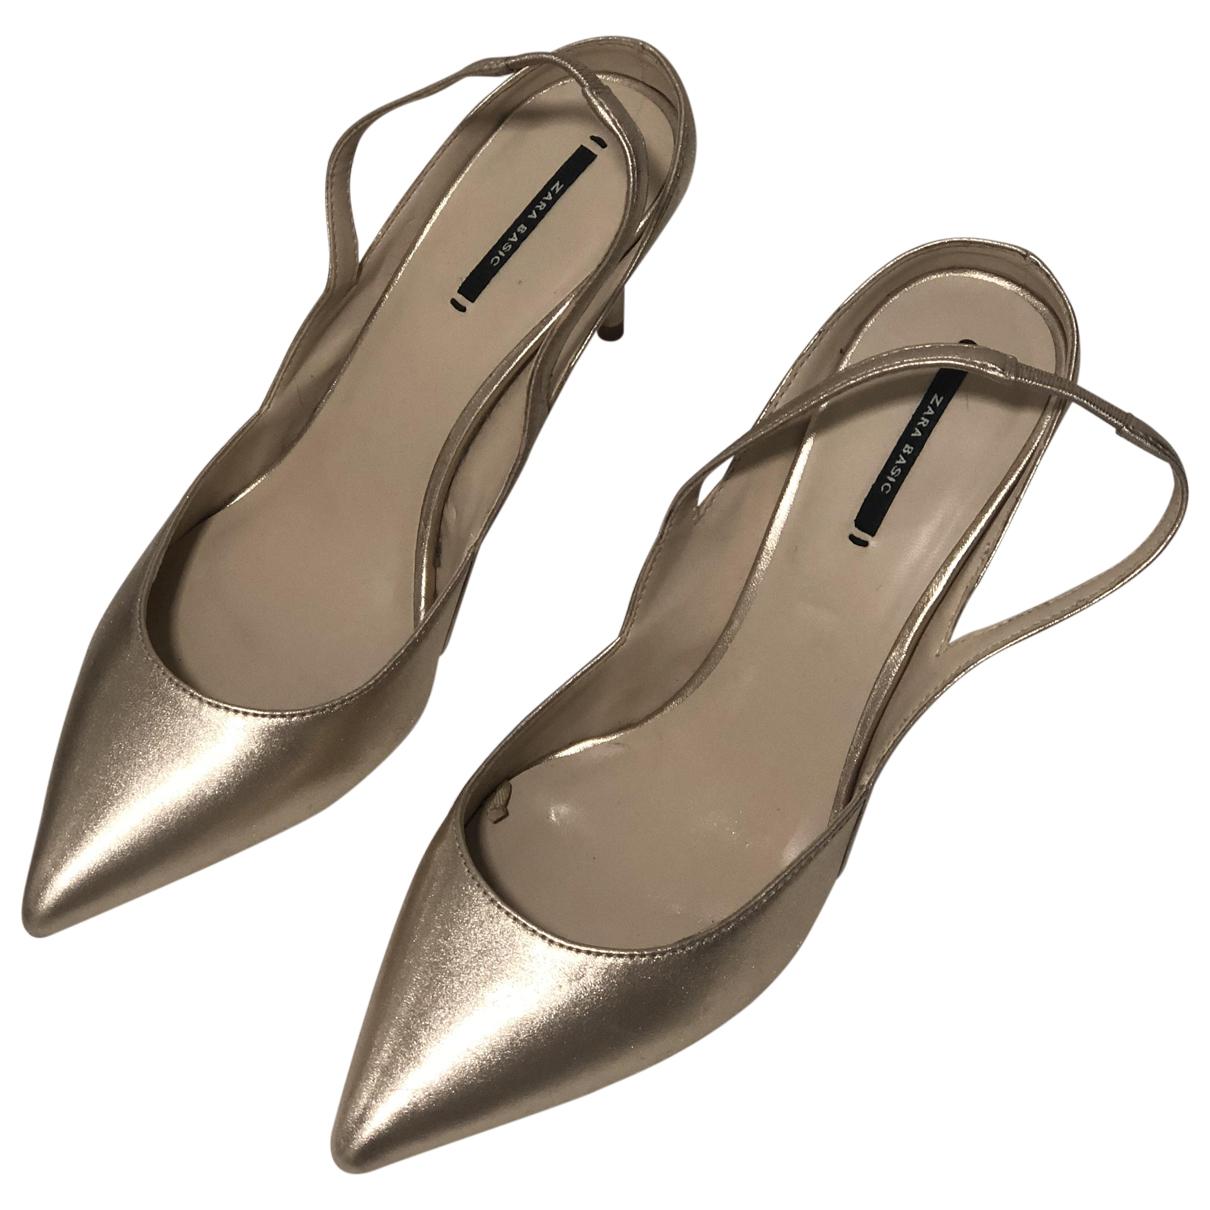 Zara \N Gold Mules & Clogs for Women 40 EU